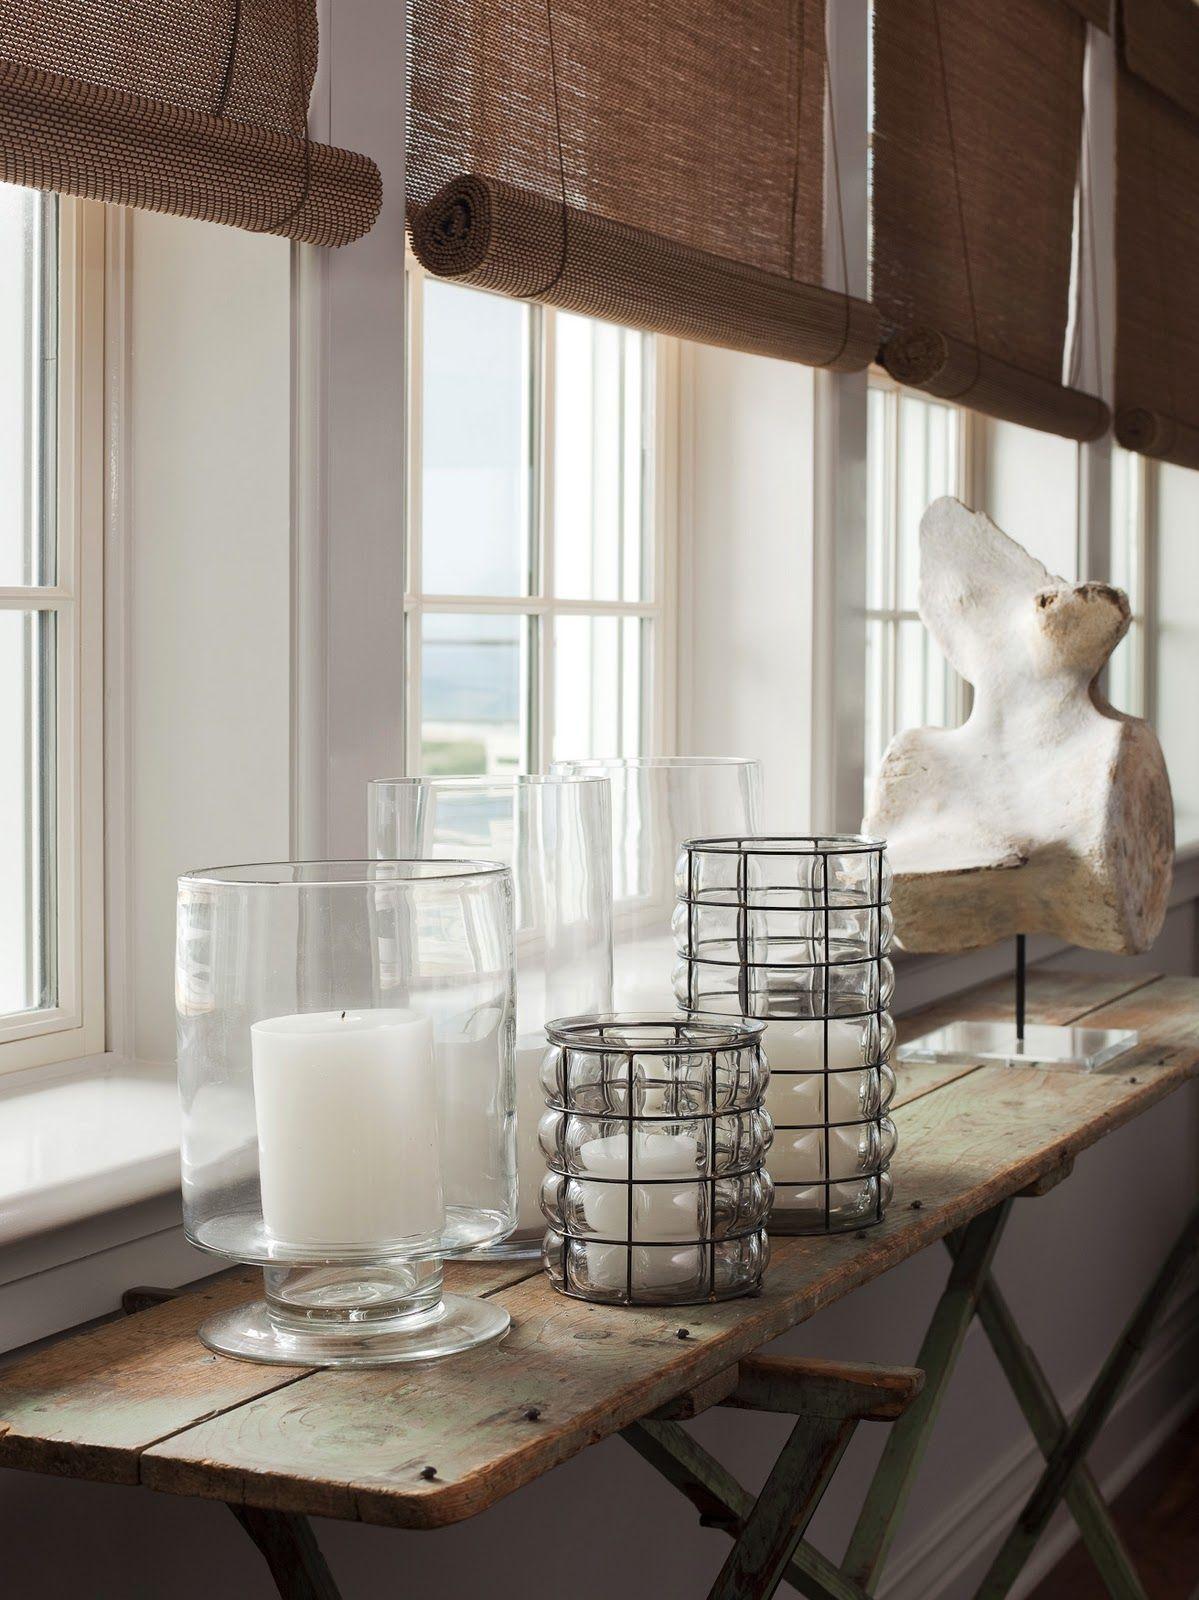 3 season porch window ideas  philip gorrivan design new york usa ocean house watch hill ri